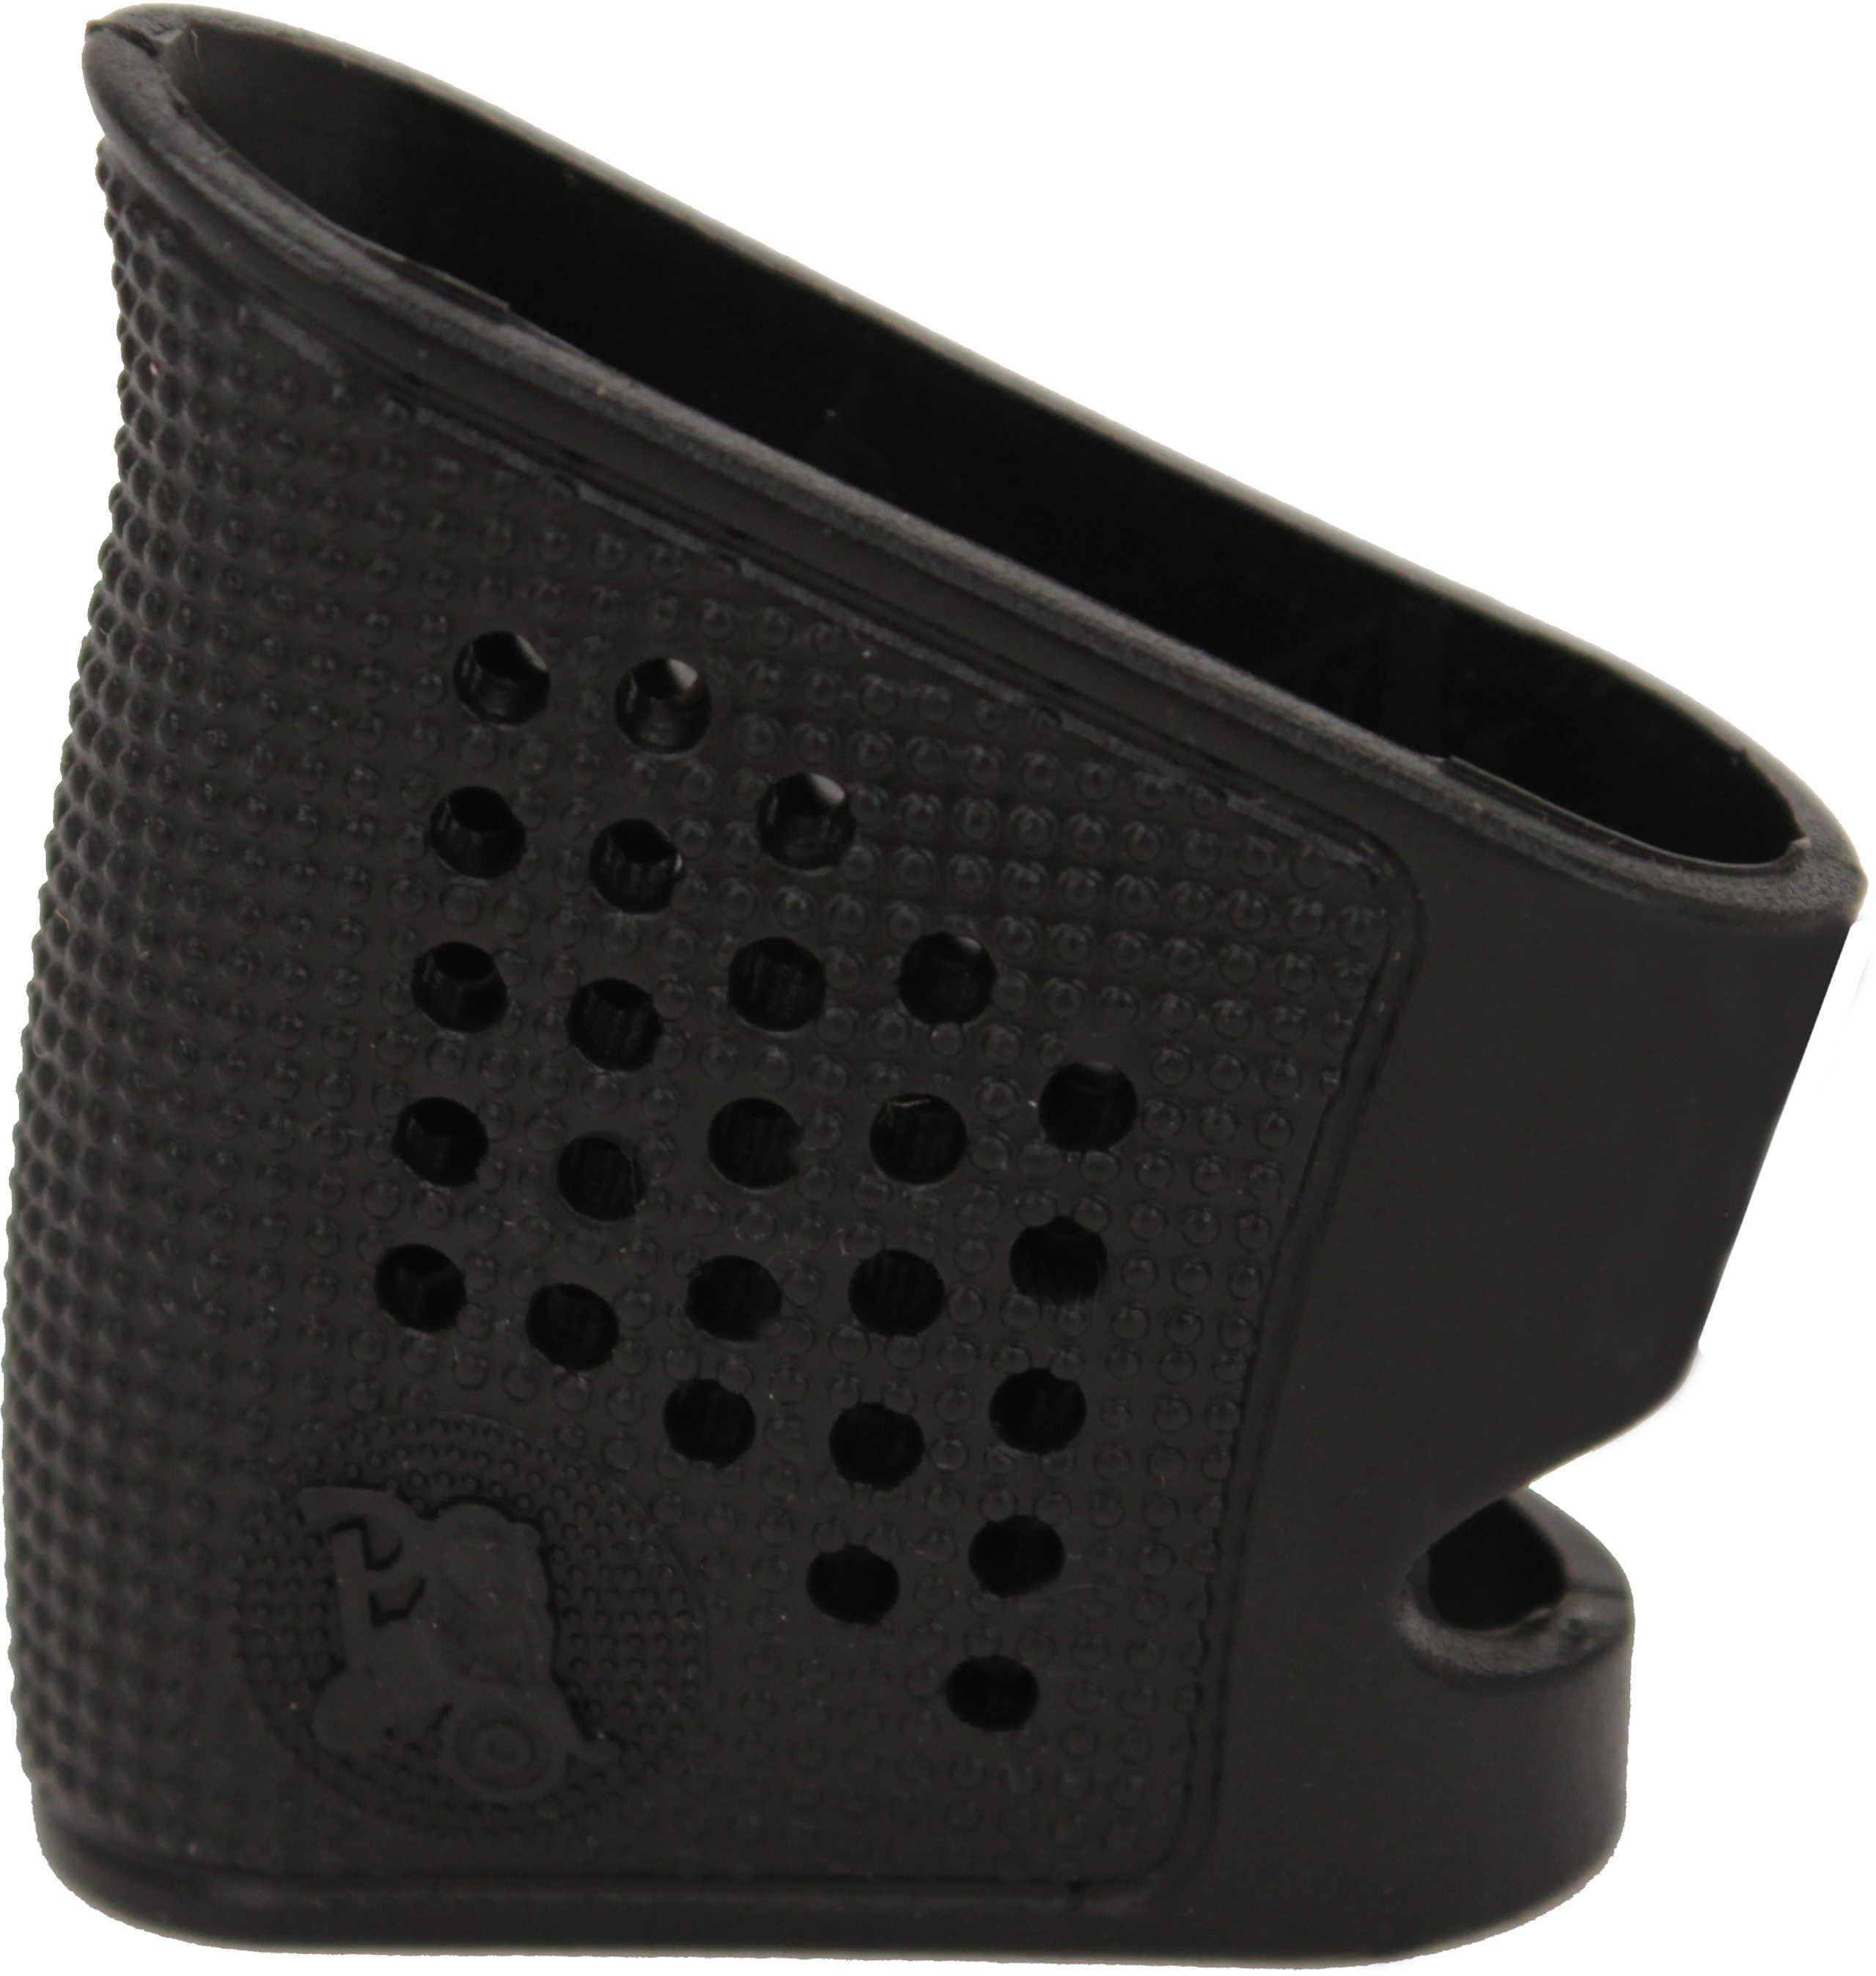 Pachmayr Grip Glove Tactical Tactical Grip Glove Black Slip-On S&W Bodyguard 05173